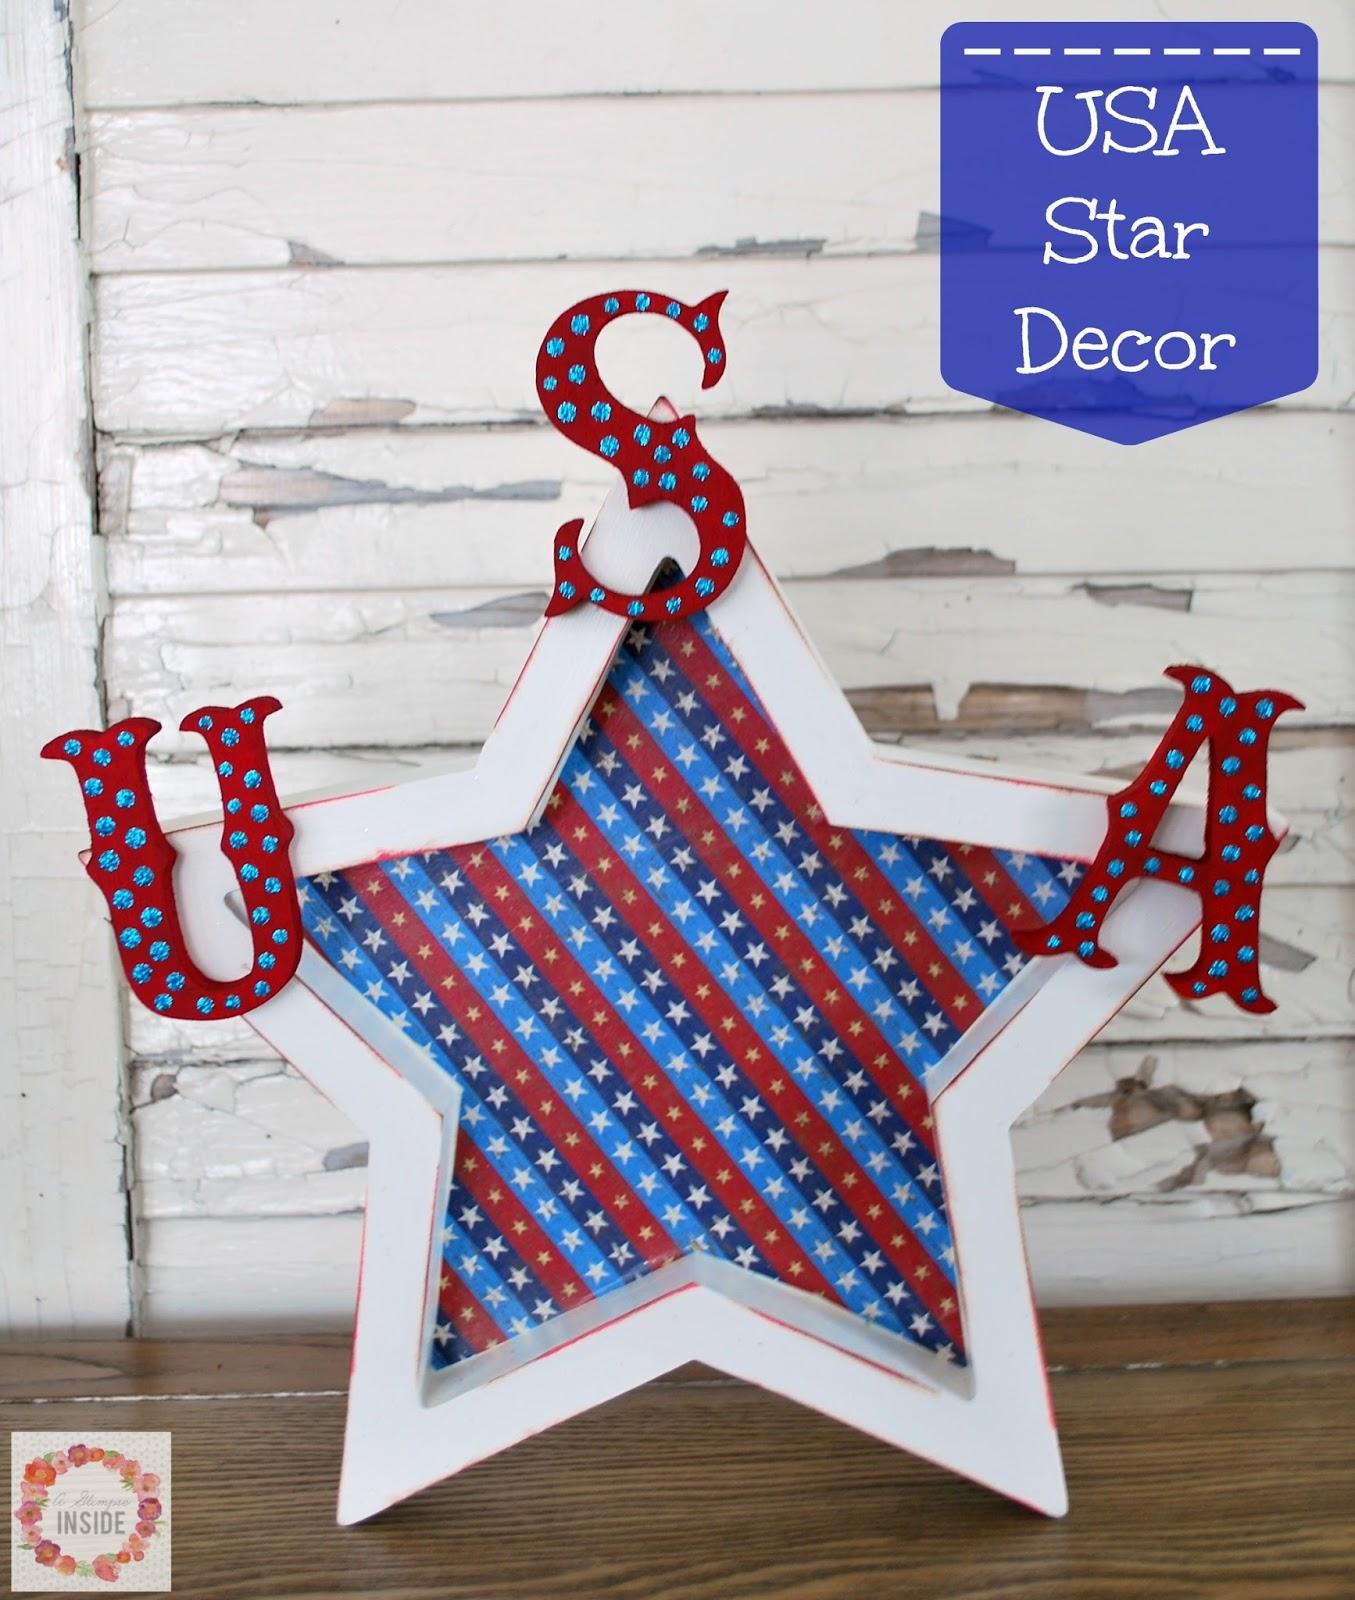 http://www.aglimpseinsideblog.com/2015/06/usa-patriotic-star-decor.html